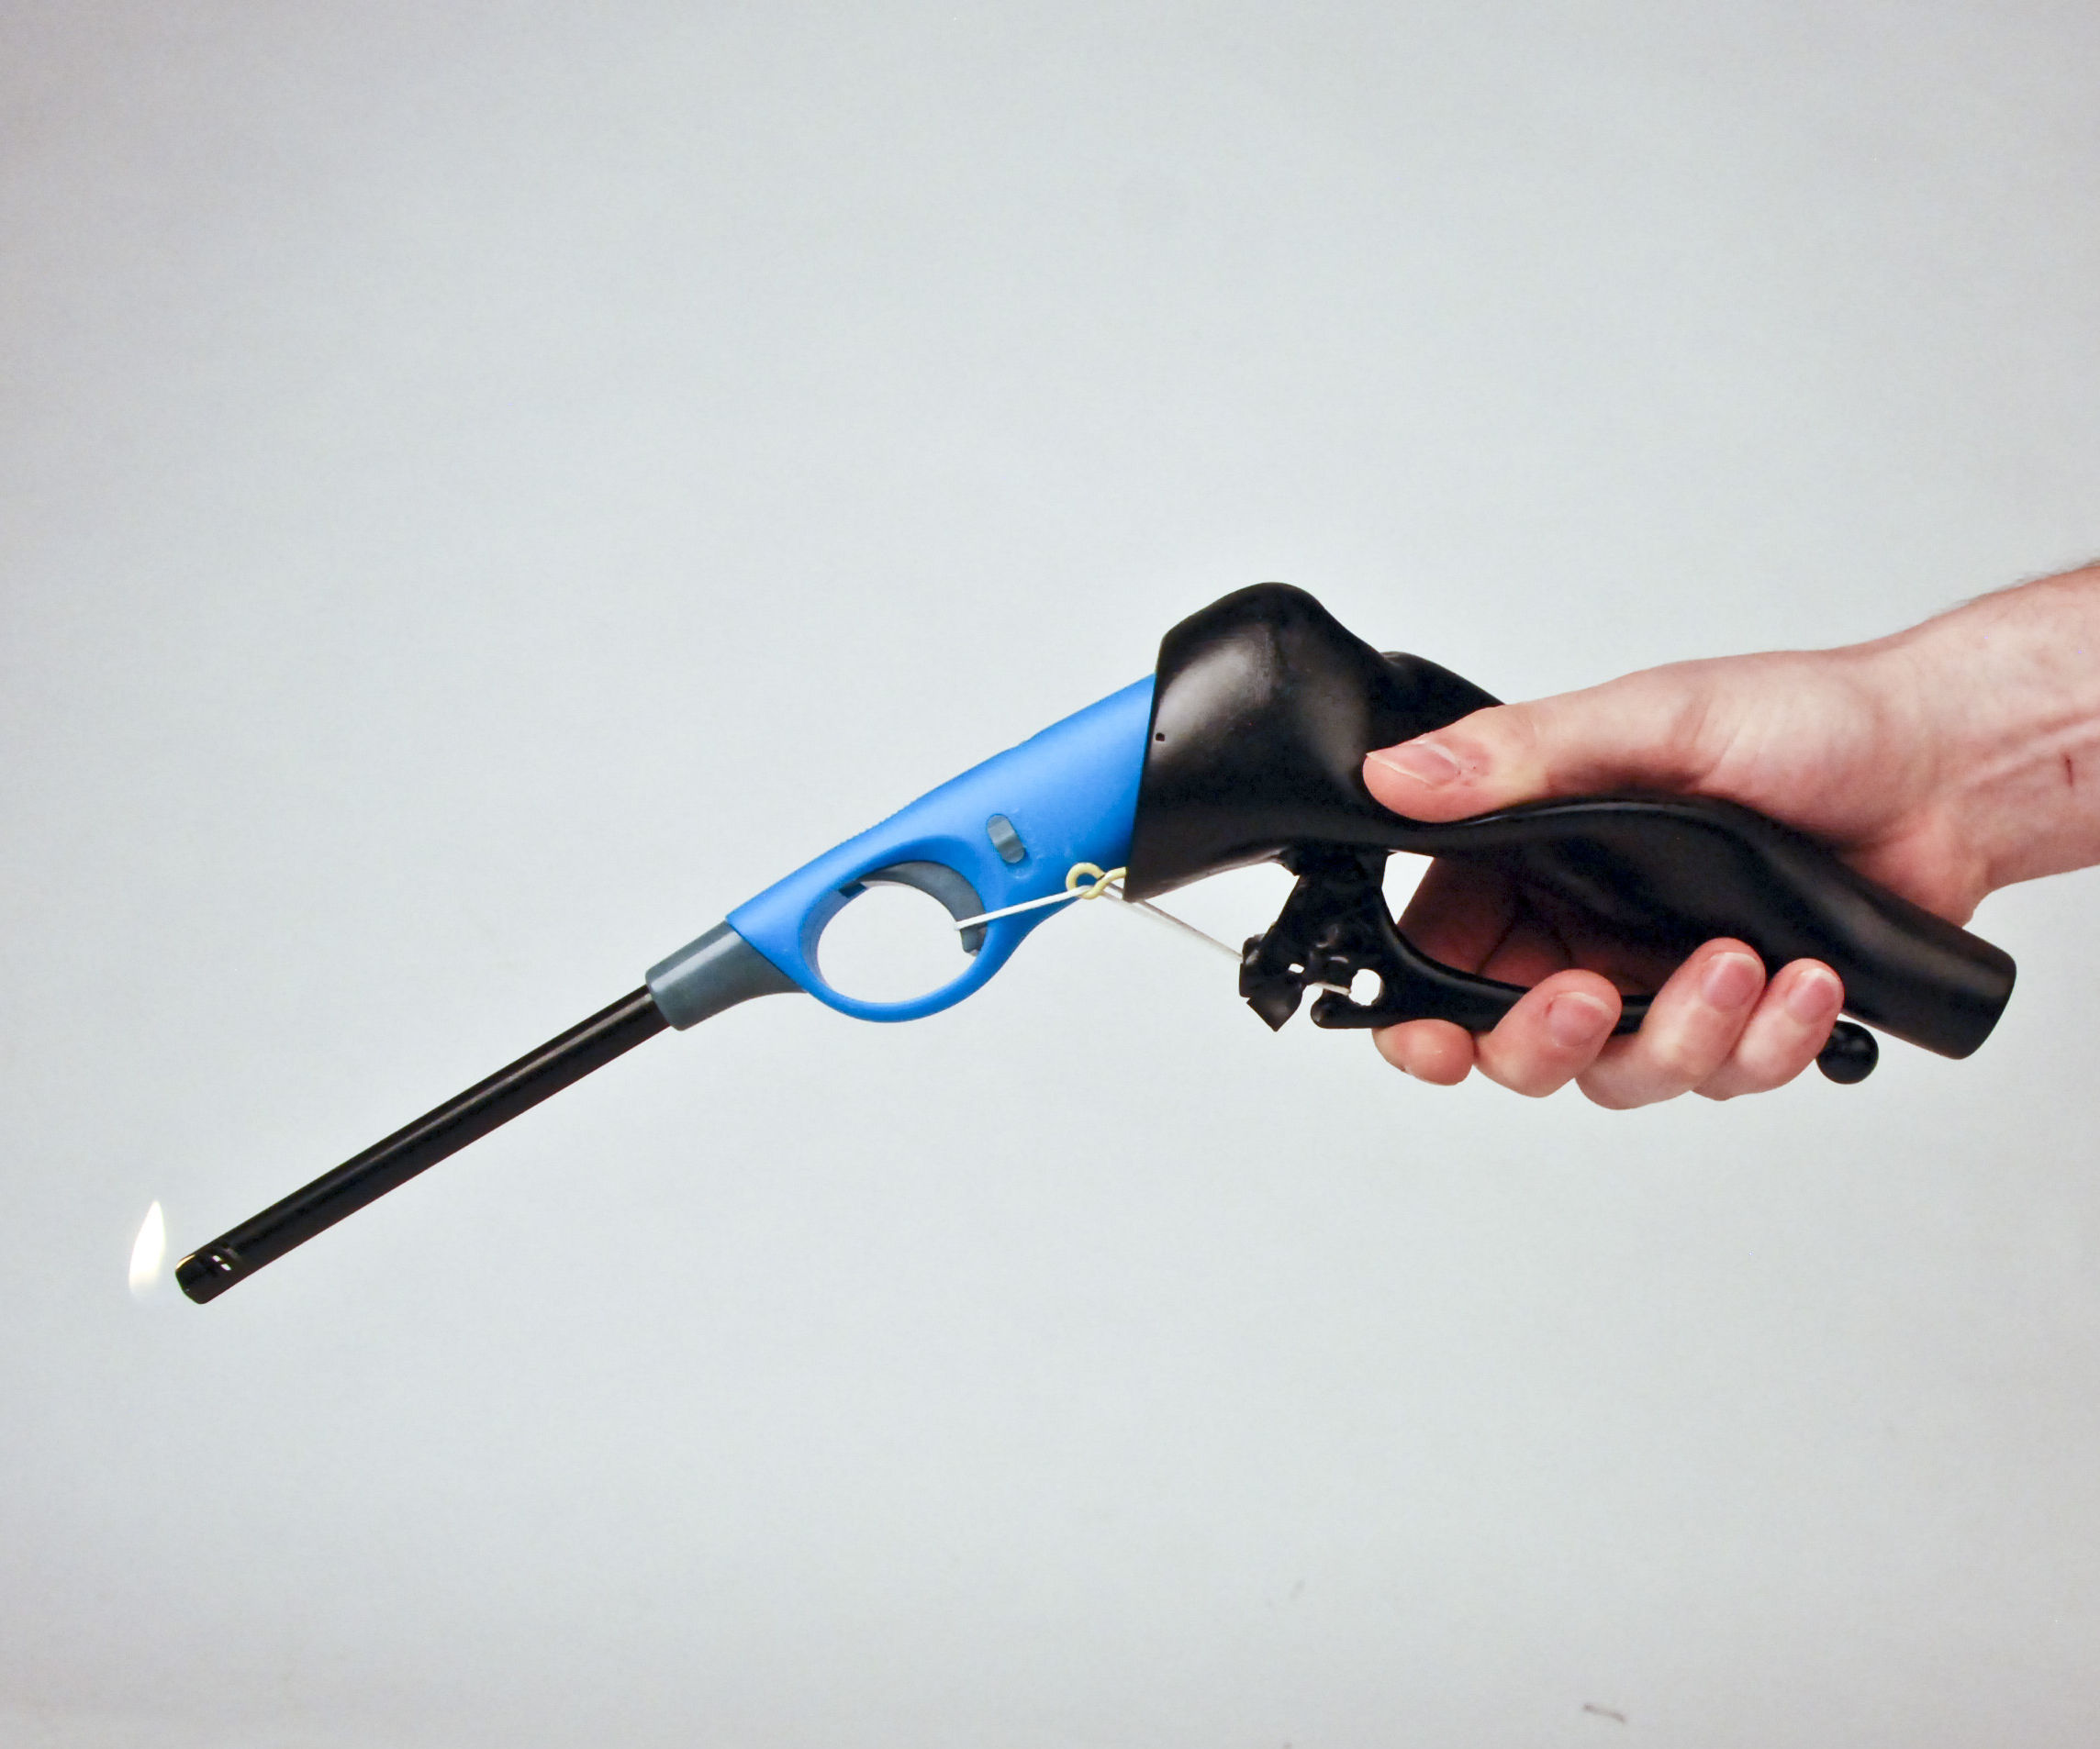 DIY Lighter Aid